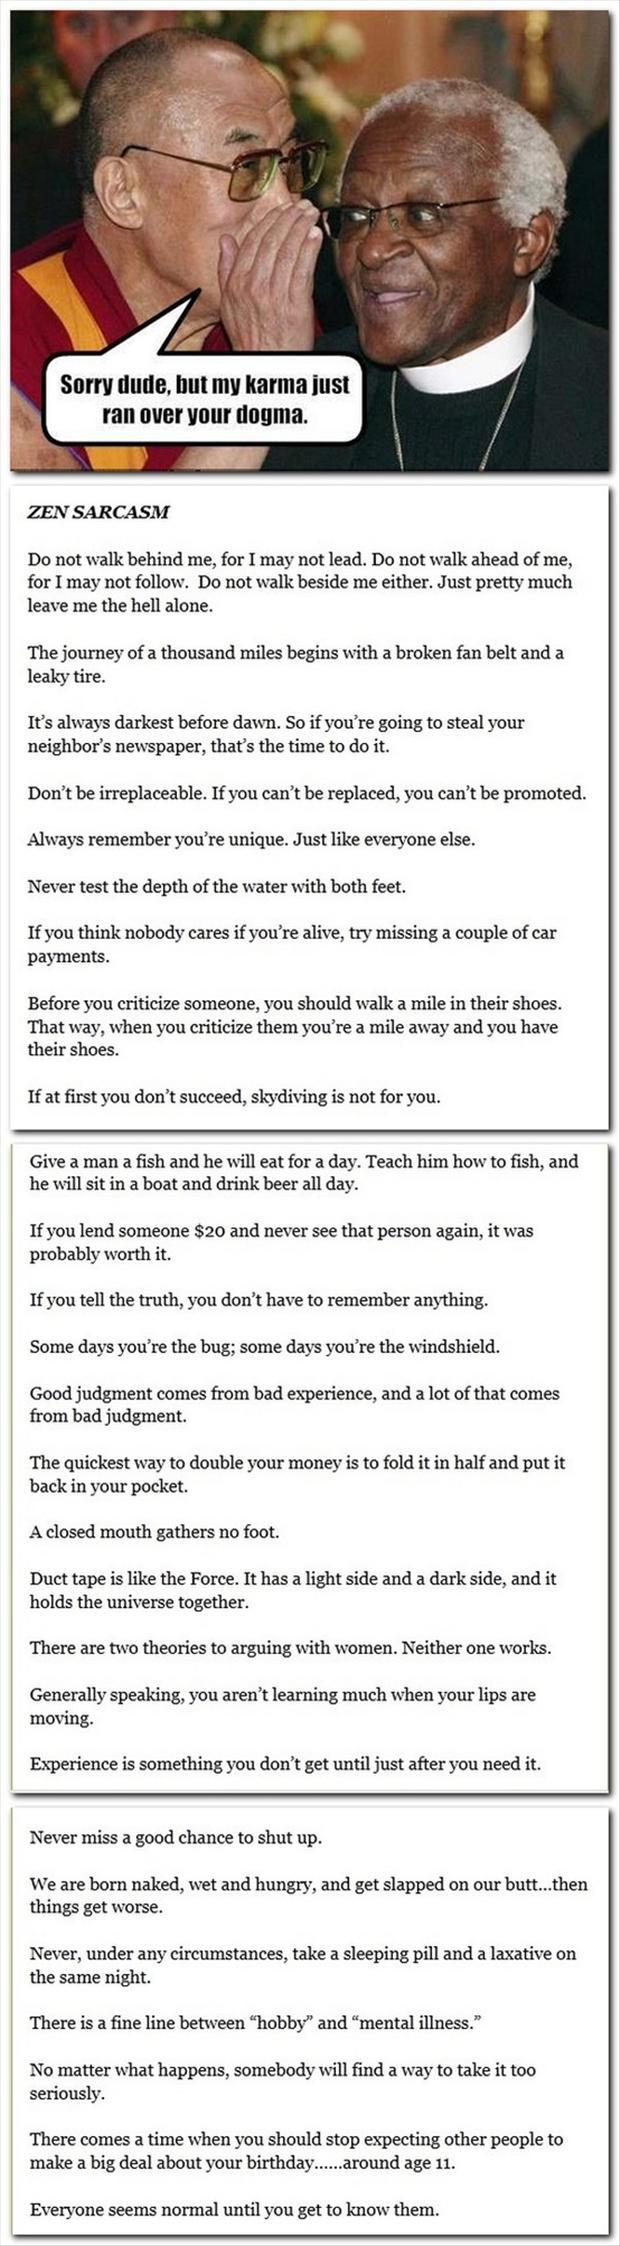 Zen Sarcasm, Funny Quotes | Work Quotes, Sarcasm Quotes